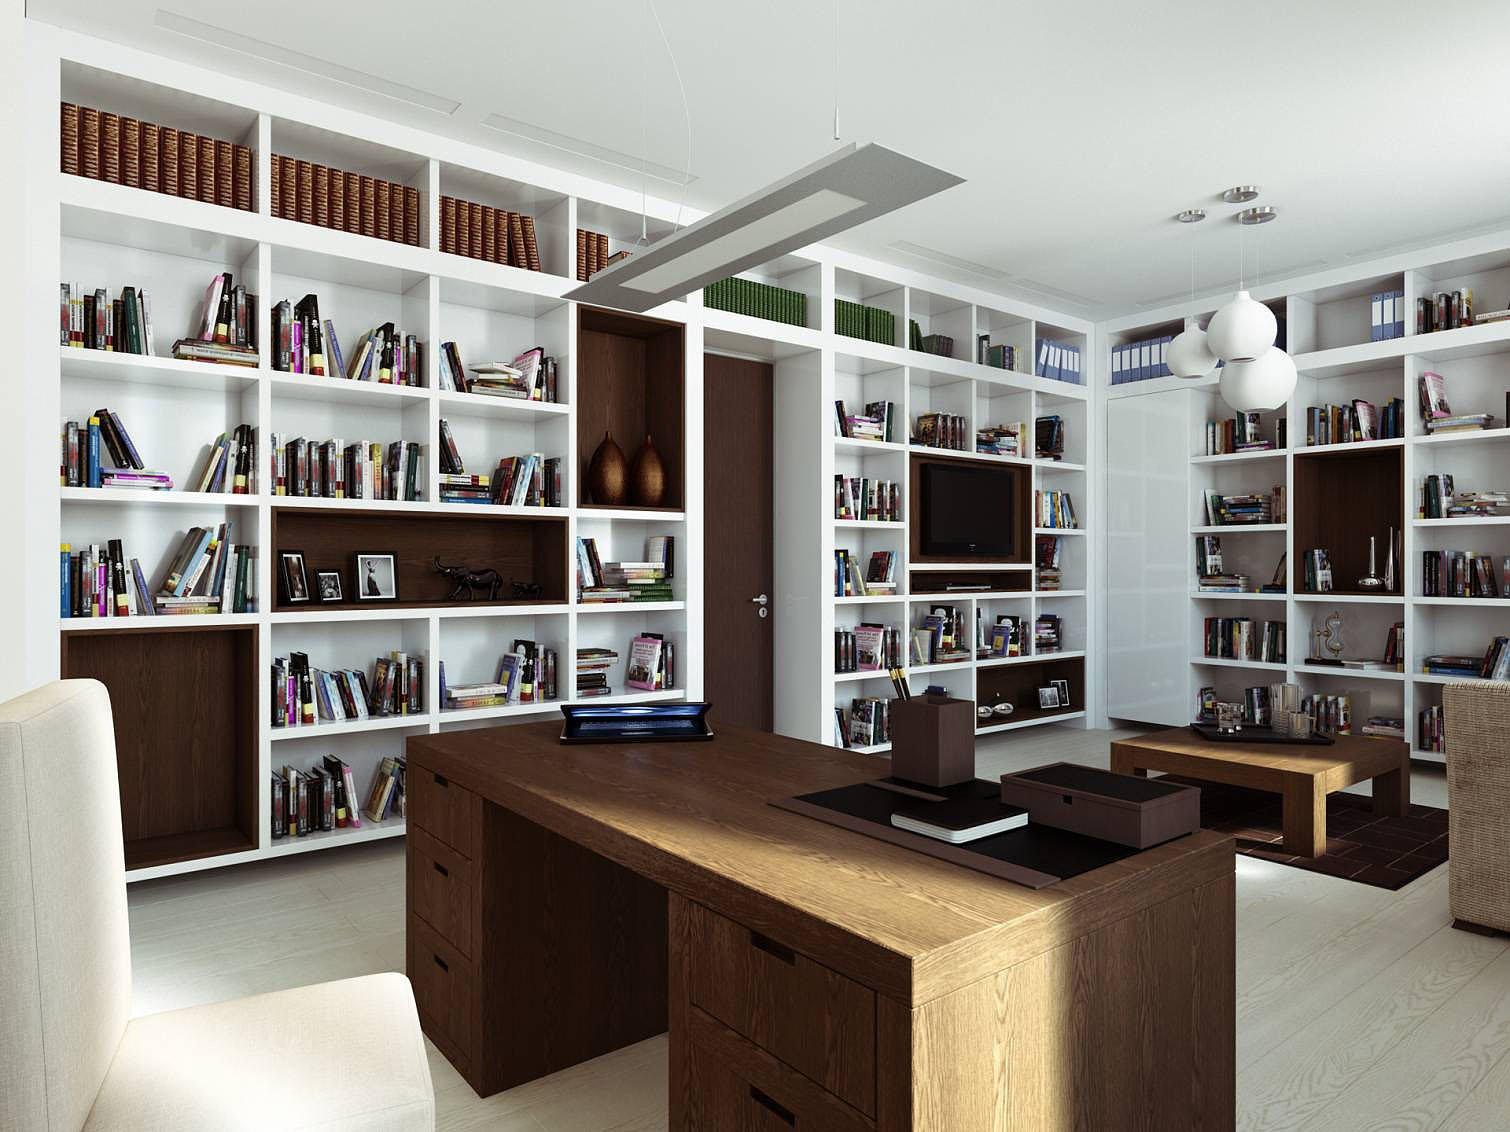 Apartment-Design-in-Moskovyan-Plaza-17